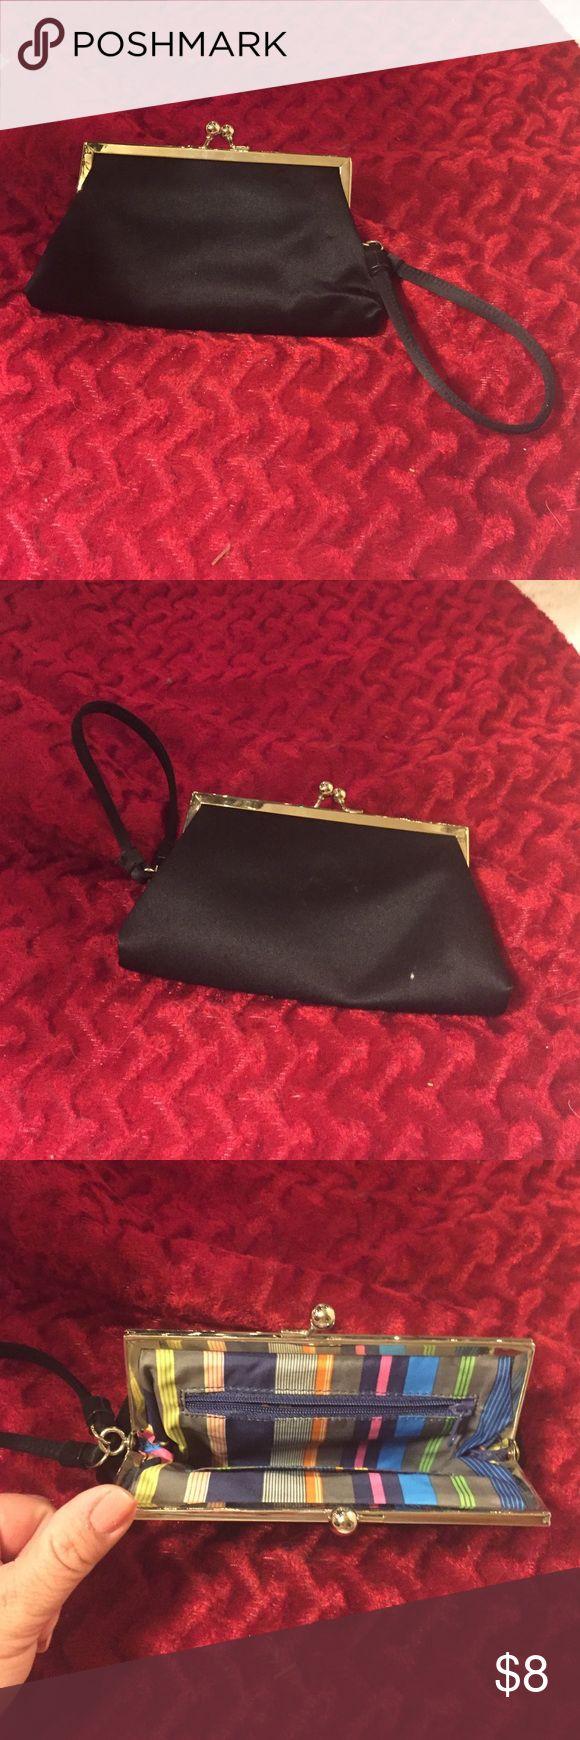 Wristlet purse Women's wristlet black purse. Non-brand. In good condition Bags Clutches & Wristlets